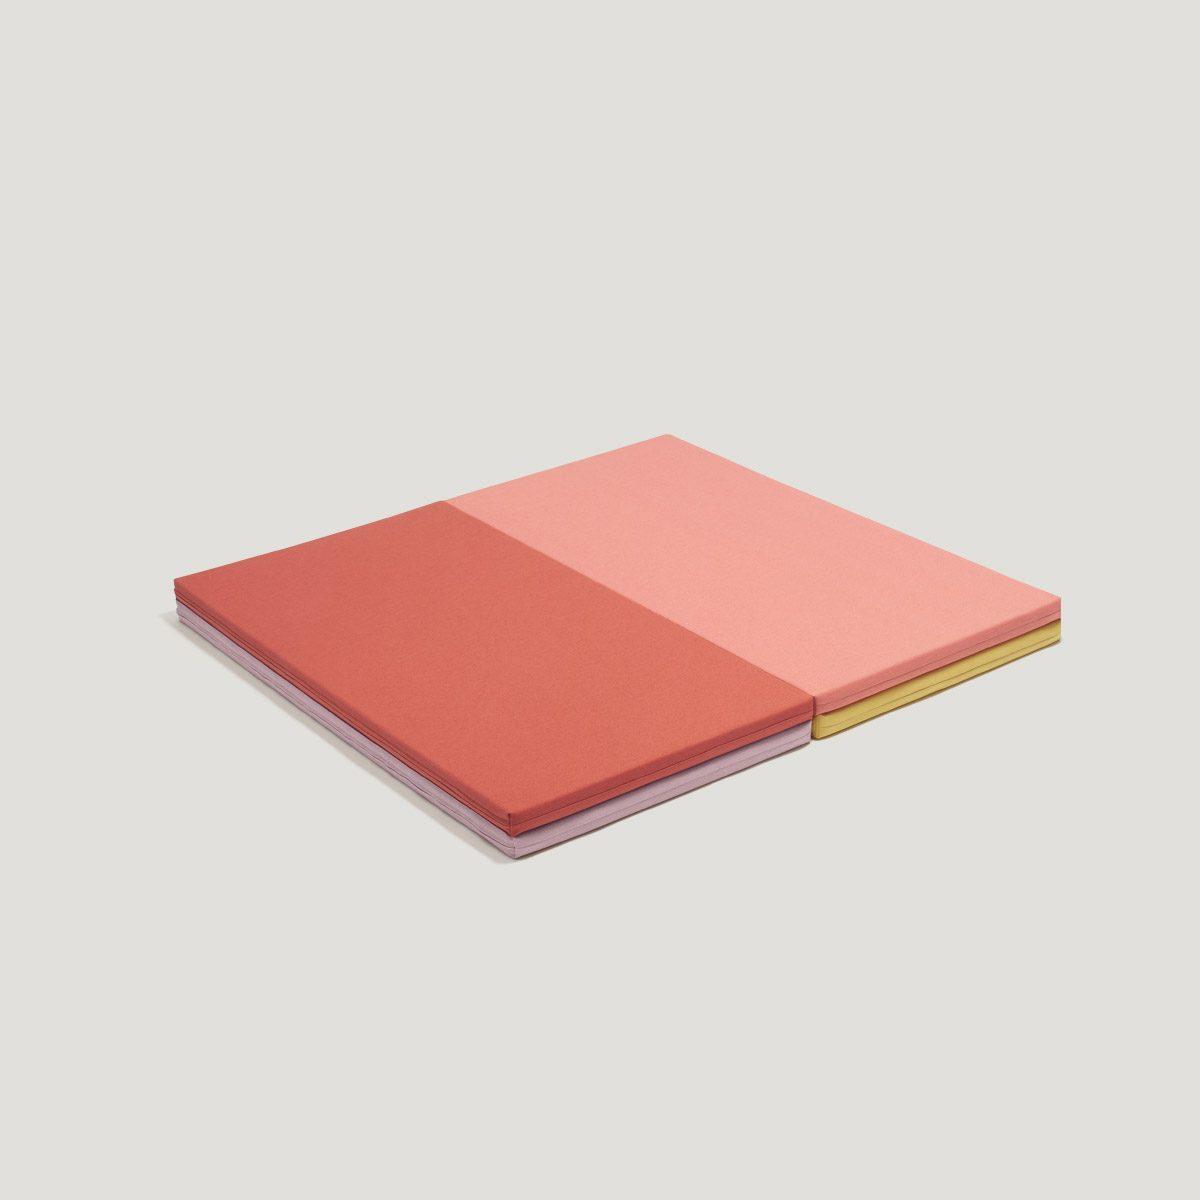 LEVEL folding play mat